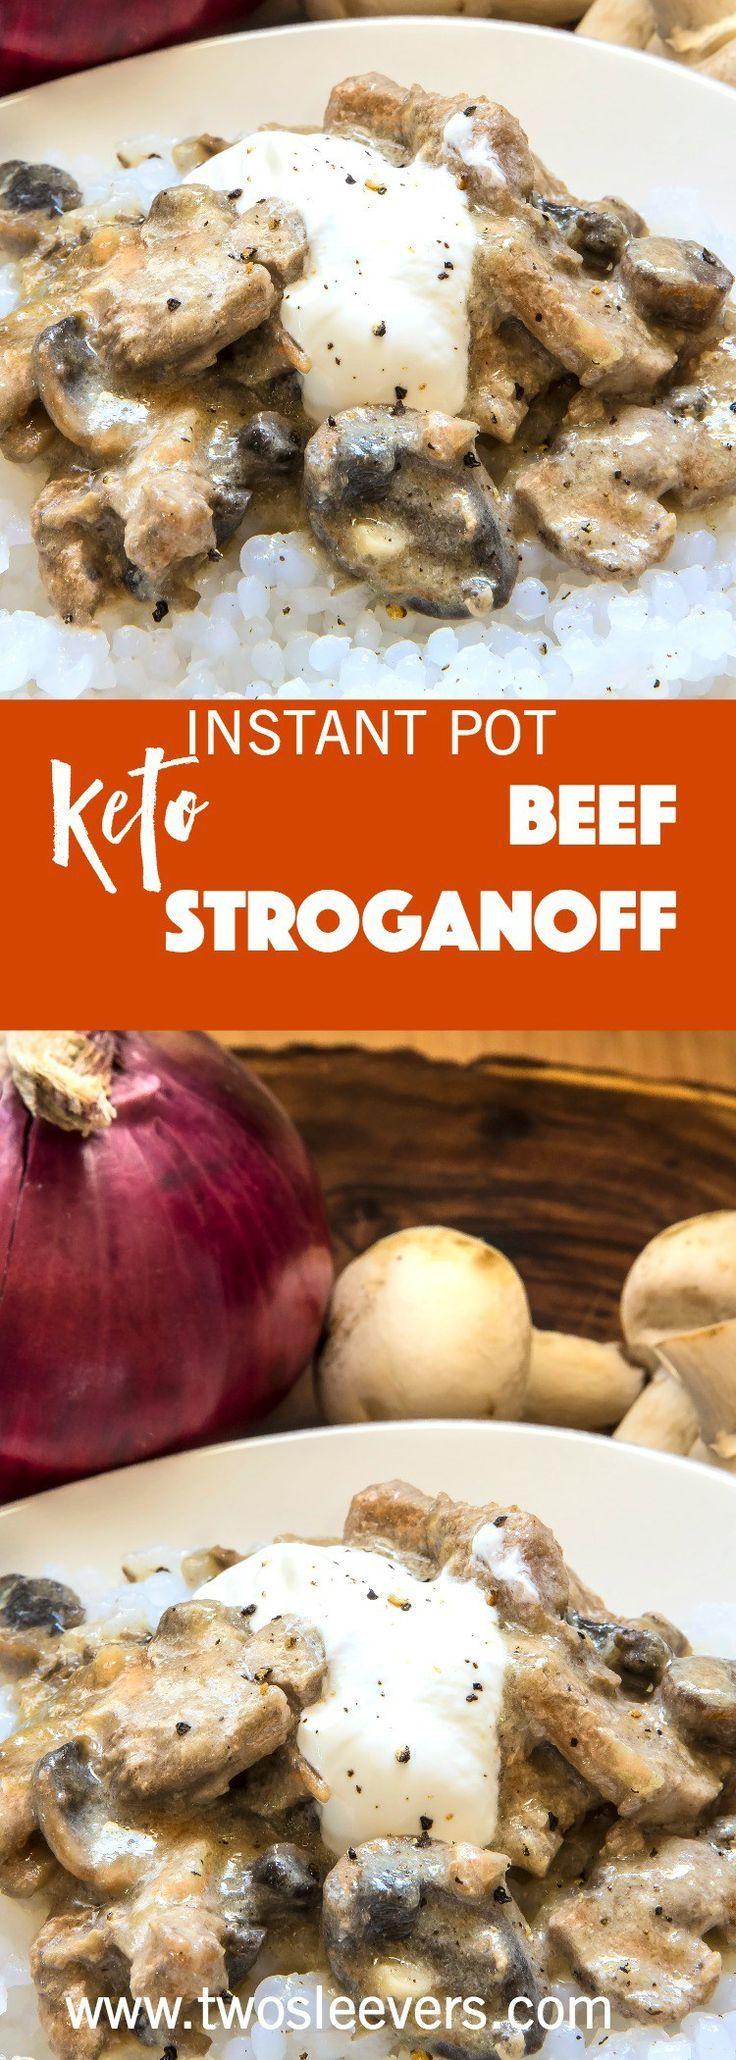 Instant Pot Keto Beef Stroganoff is a creamy, rich…